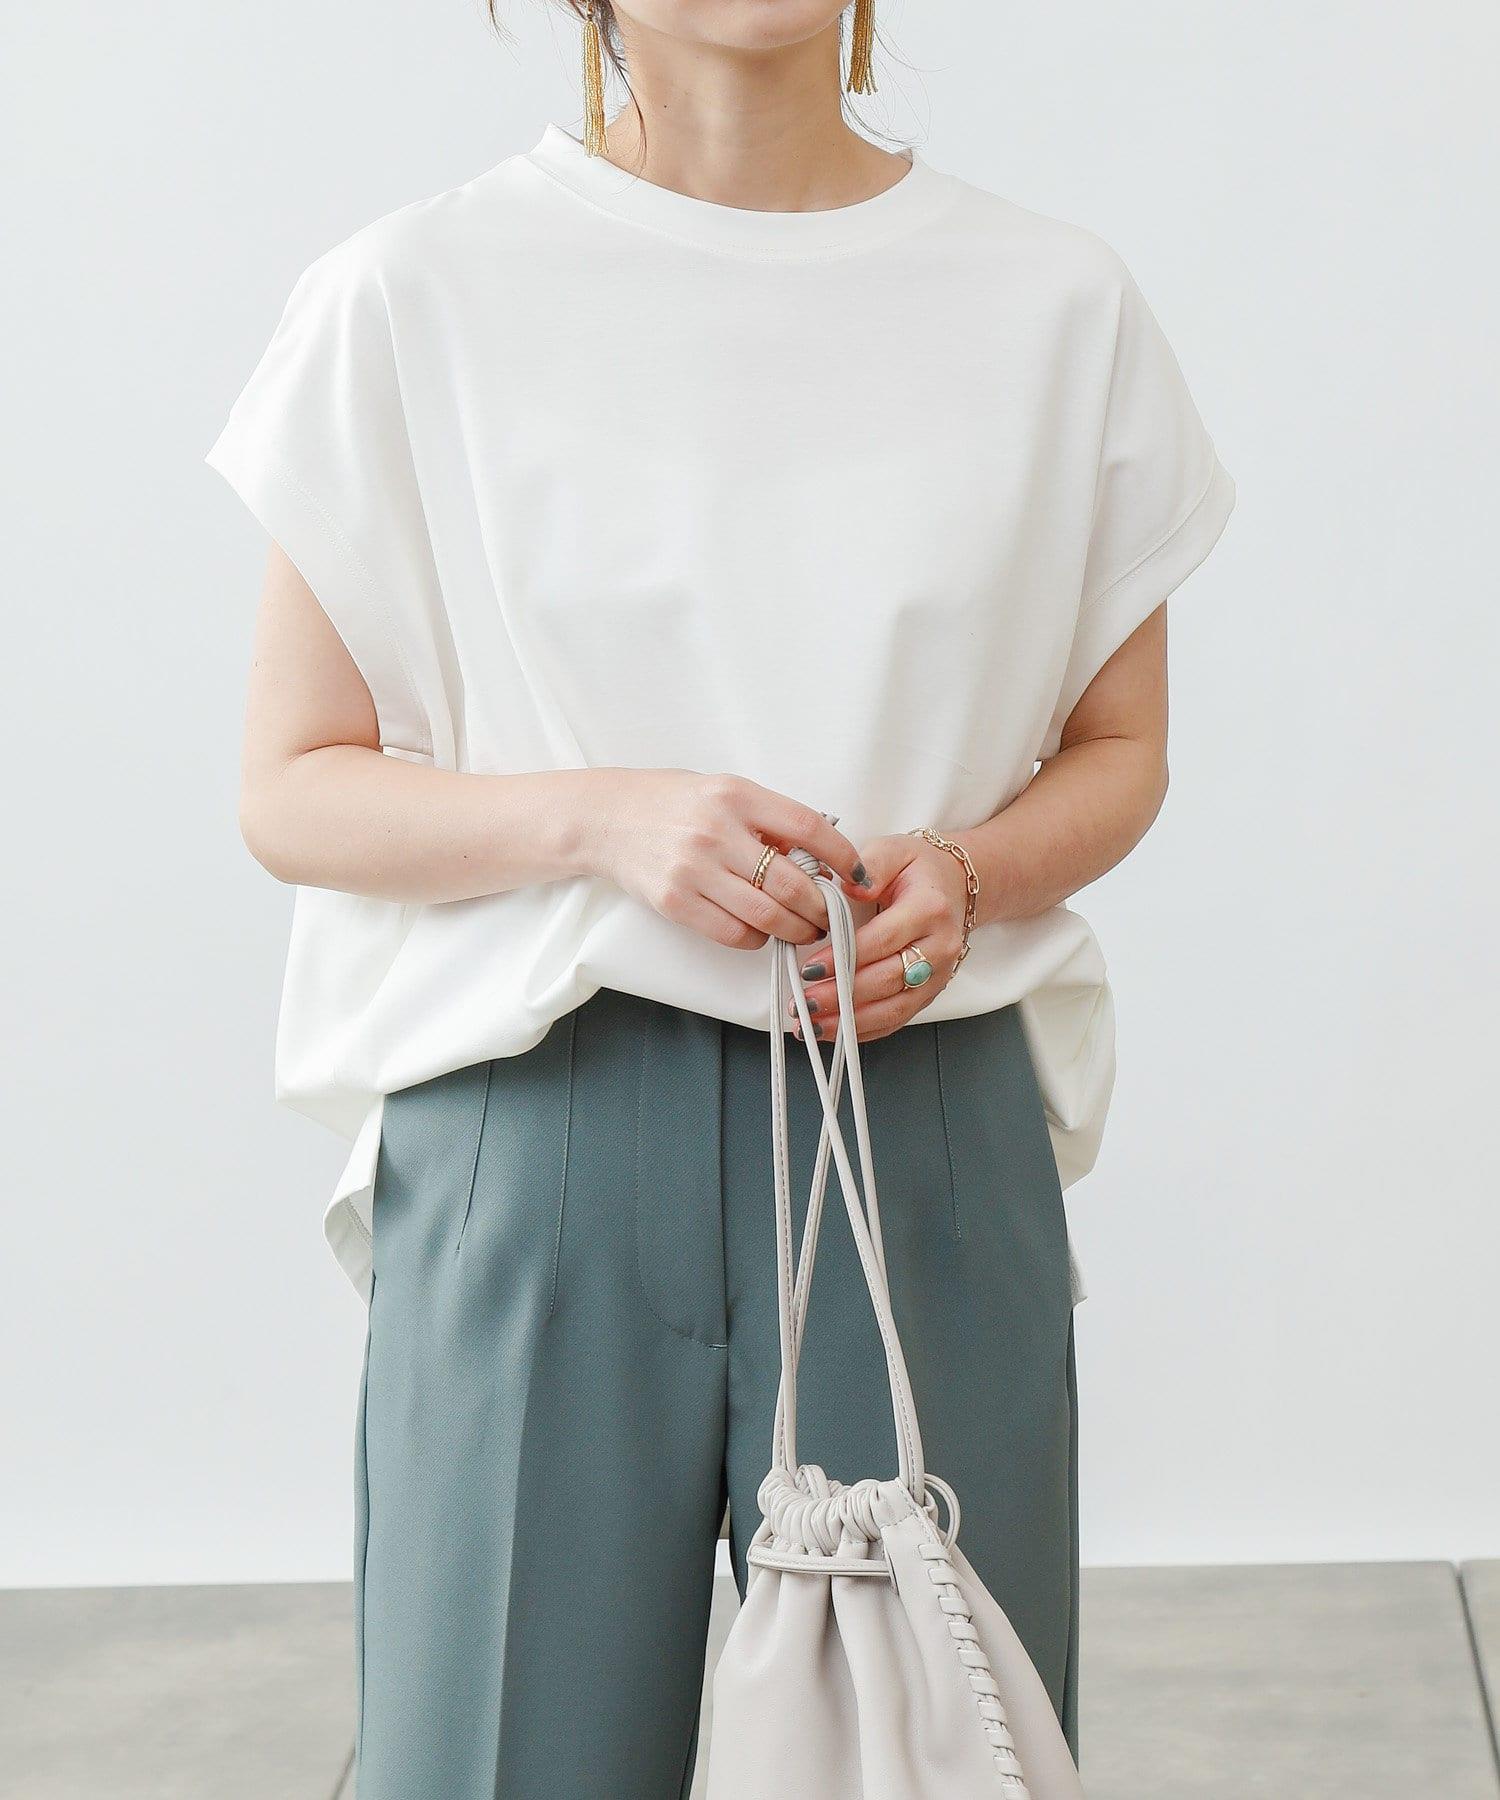 COLONY 2139(コロニー トゥーワンスリーナイン) 【WEB・一部店舗限定】BigノースリTシャツ